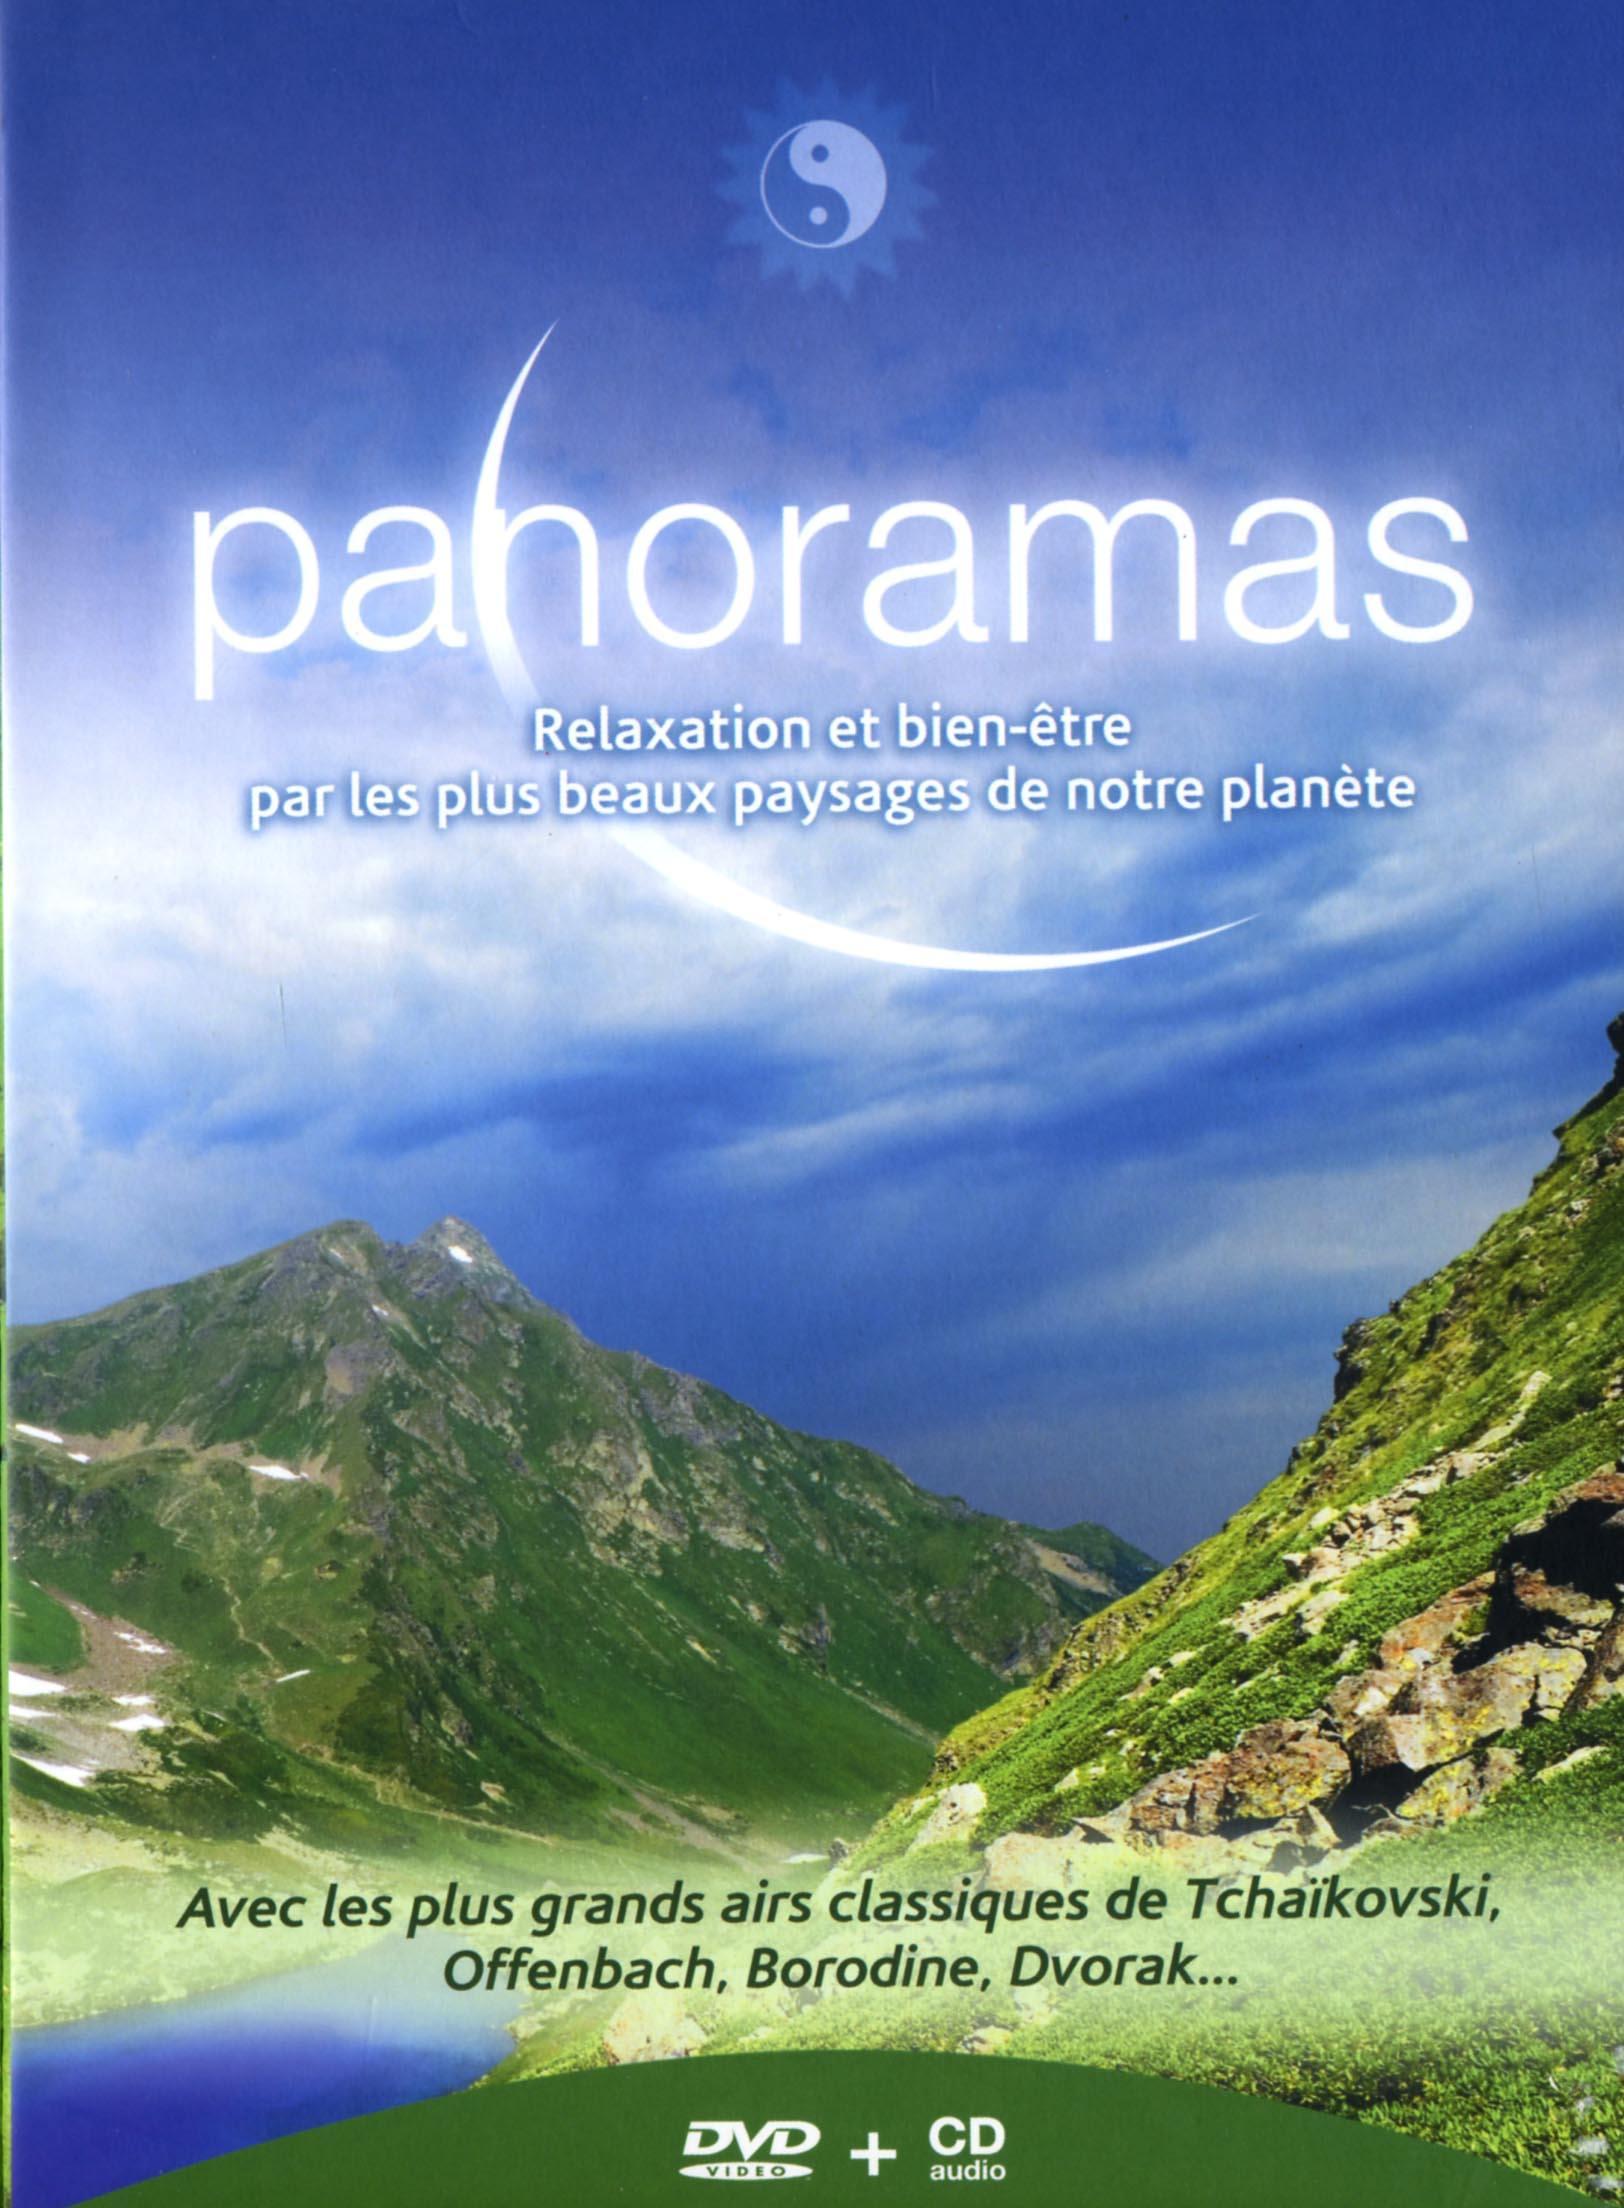 Panoramas - dvd + cd